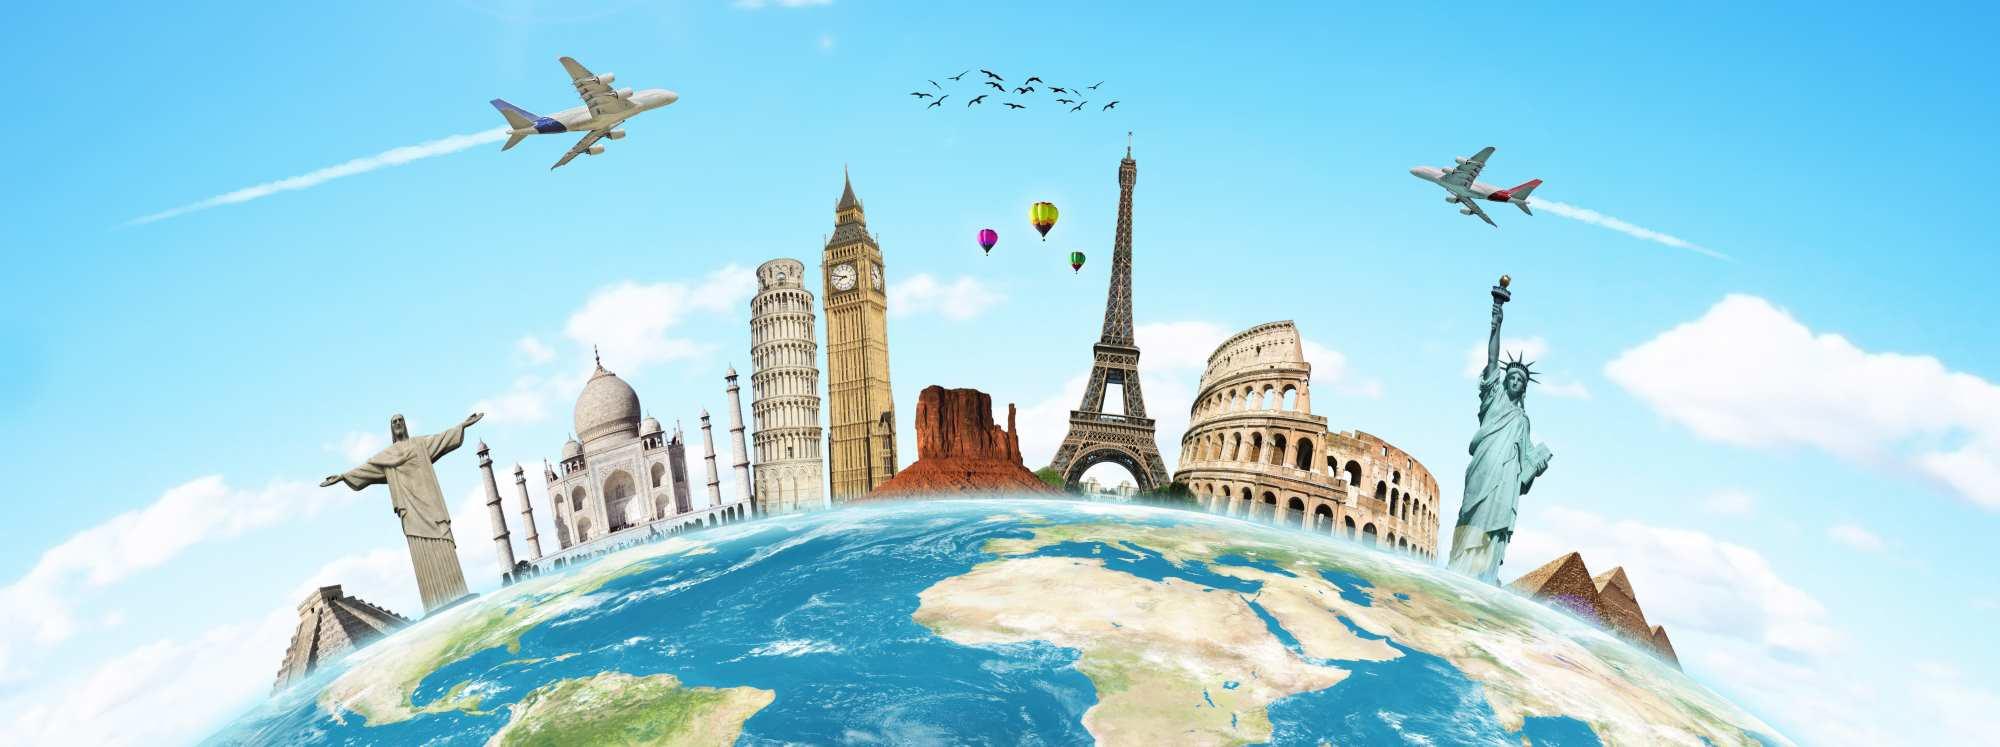 Agenzia Deprizio Travel